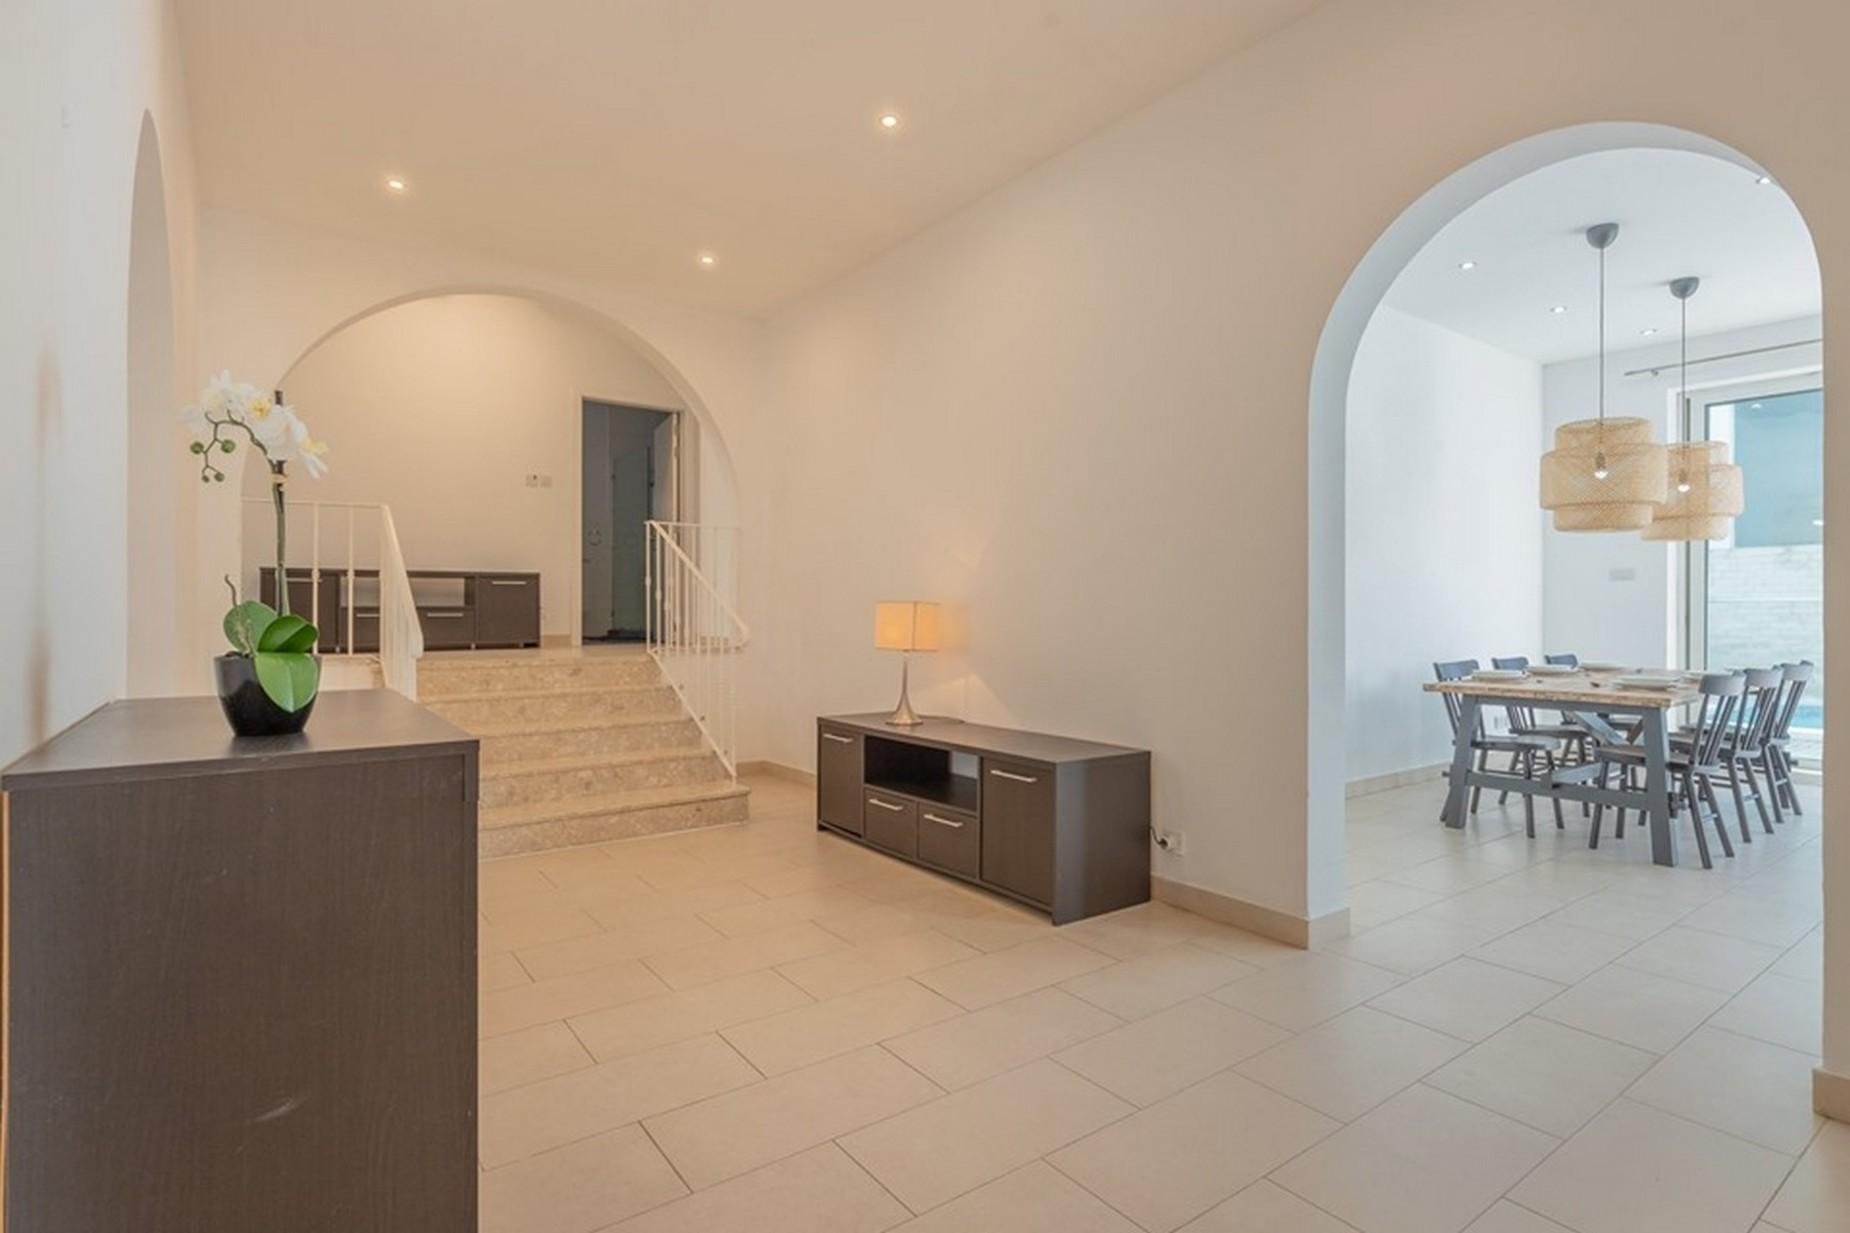 3 bed Maisonette For Rent in Ibragg, Ibragg - thumb 12